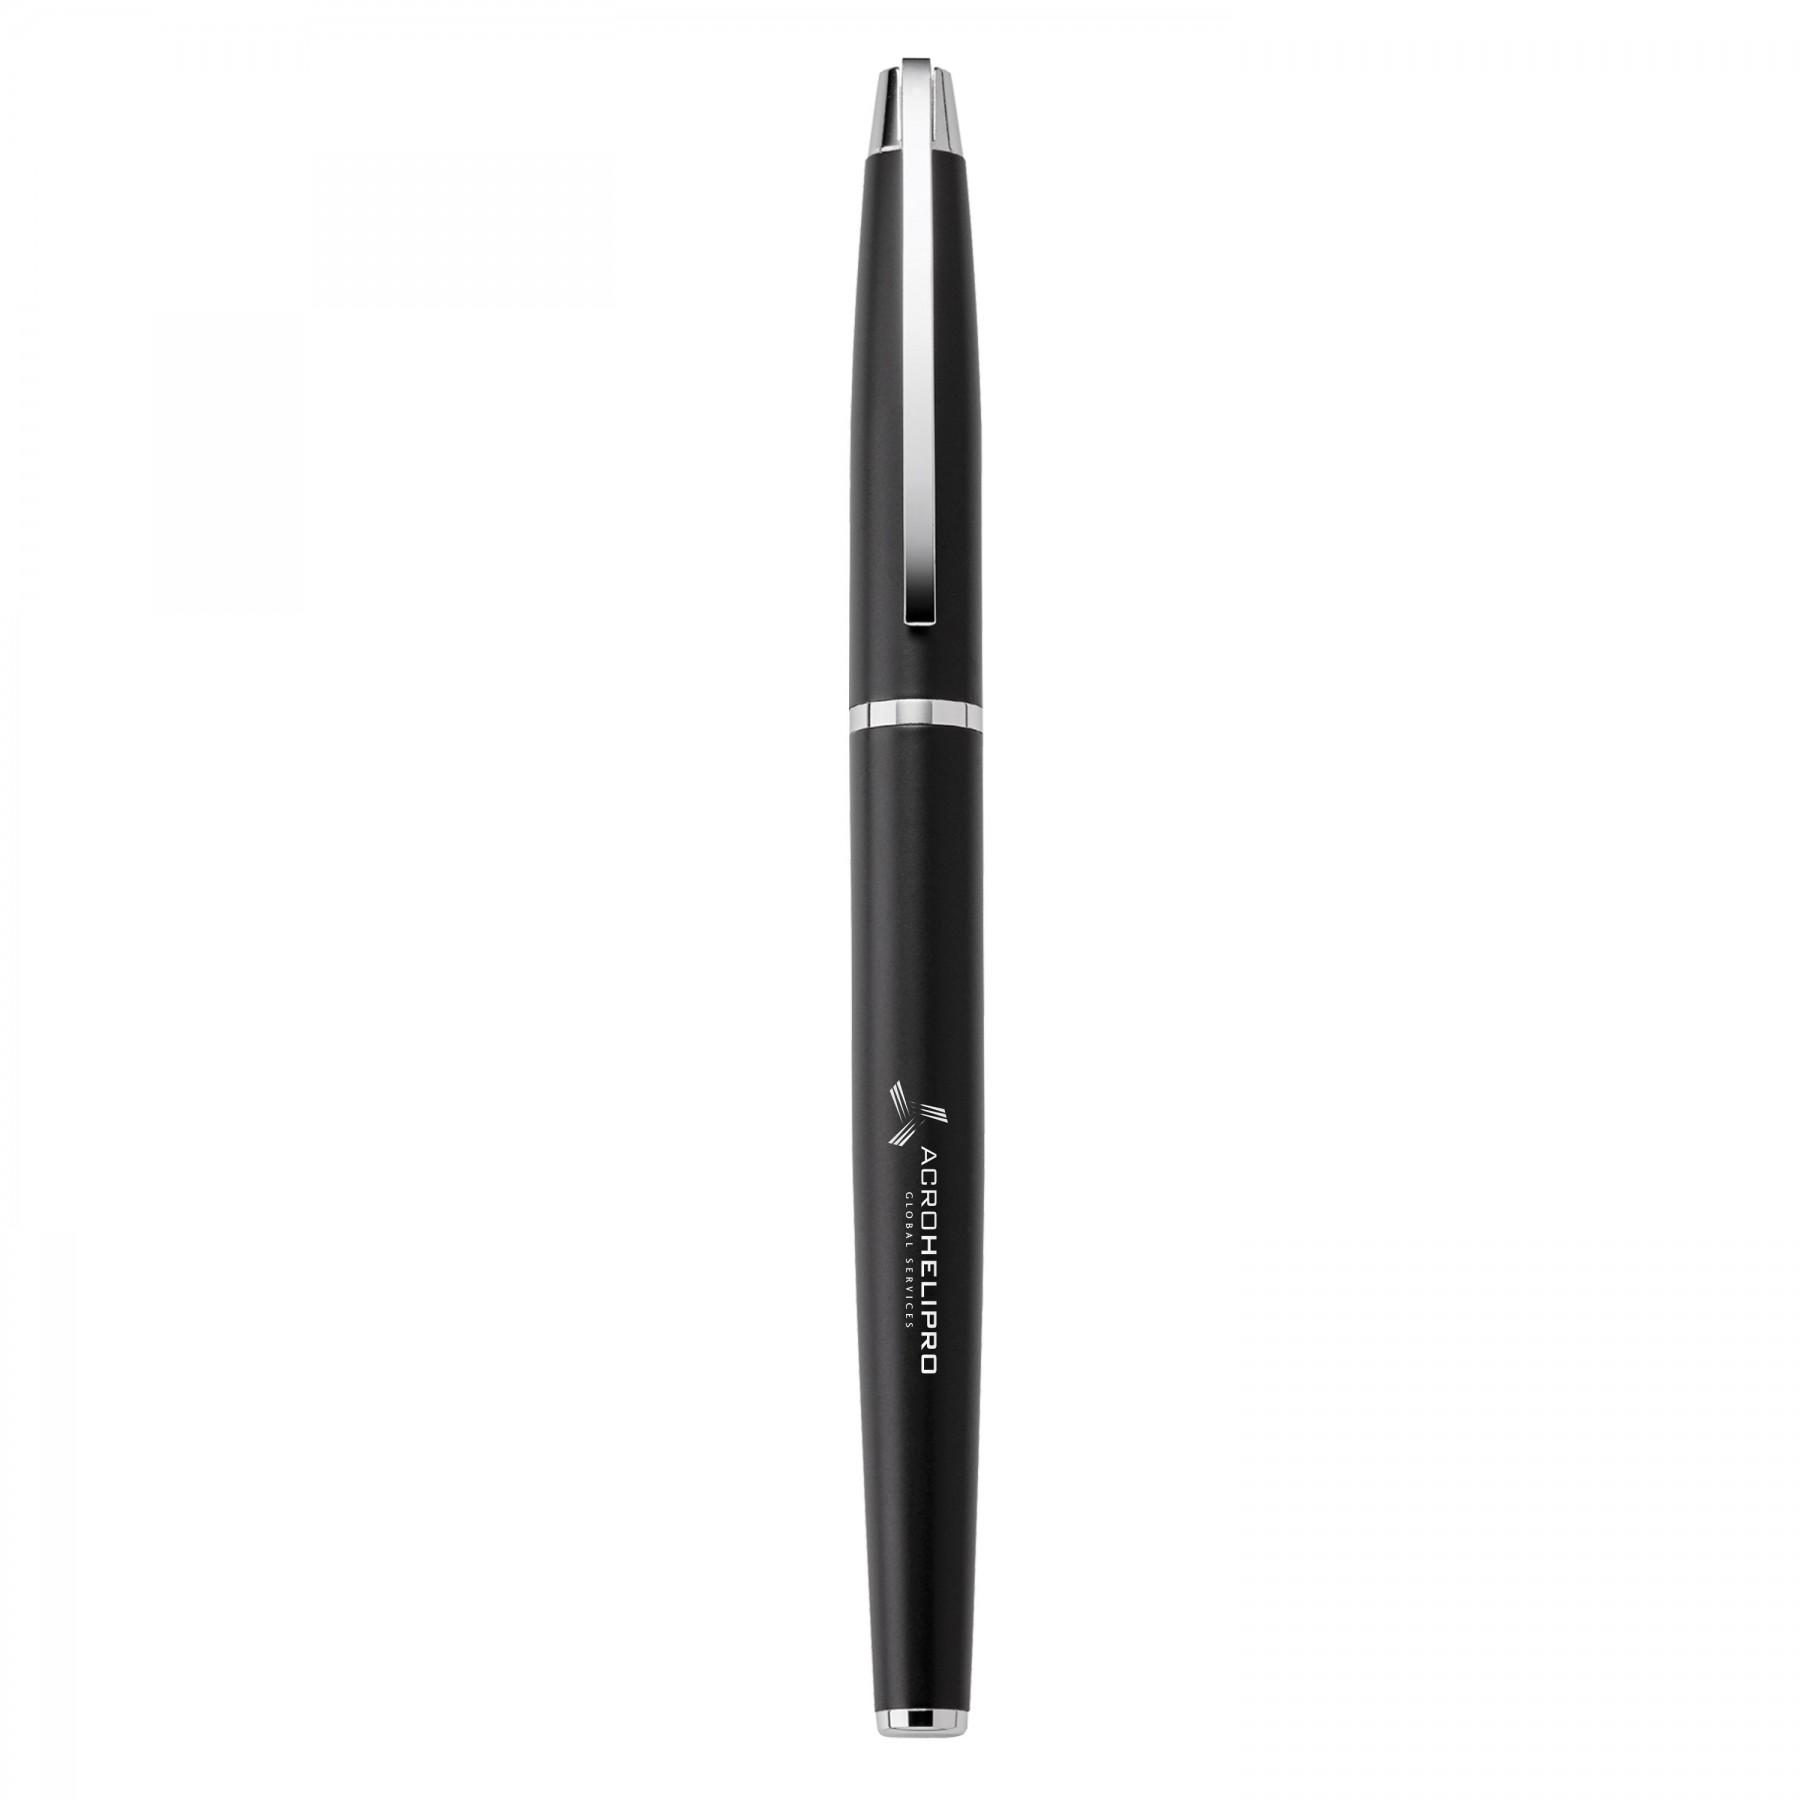 Wisdom Rollerball Pen, G4055, Laser Imprint